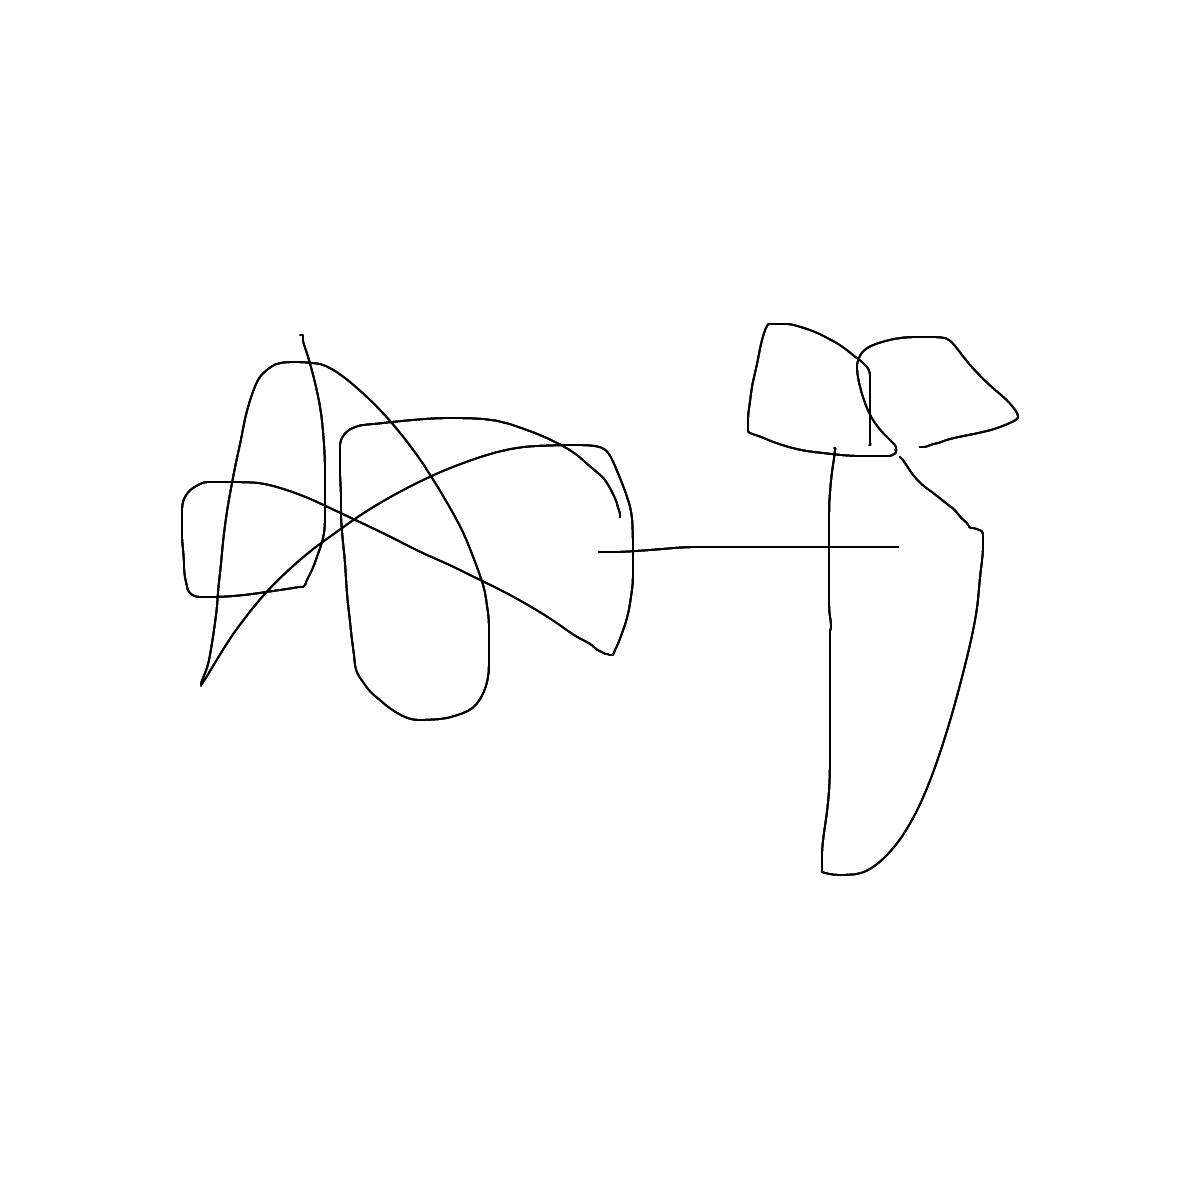 BAAAM drawing#2674 lat:30.3922615051269530lng: -97.7080230712890600